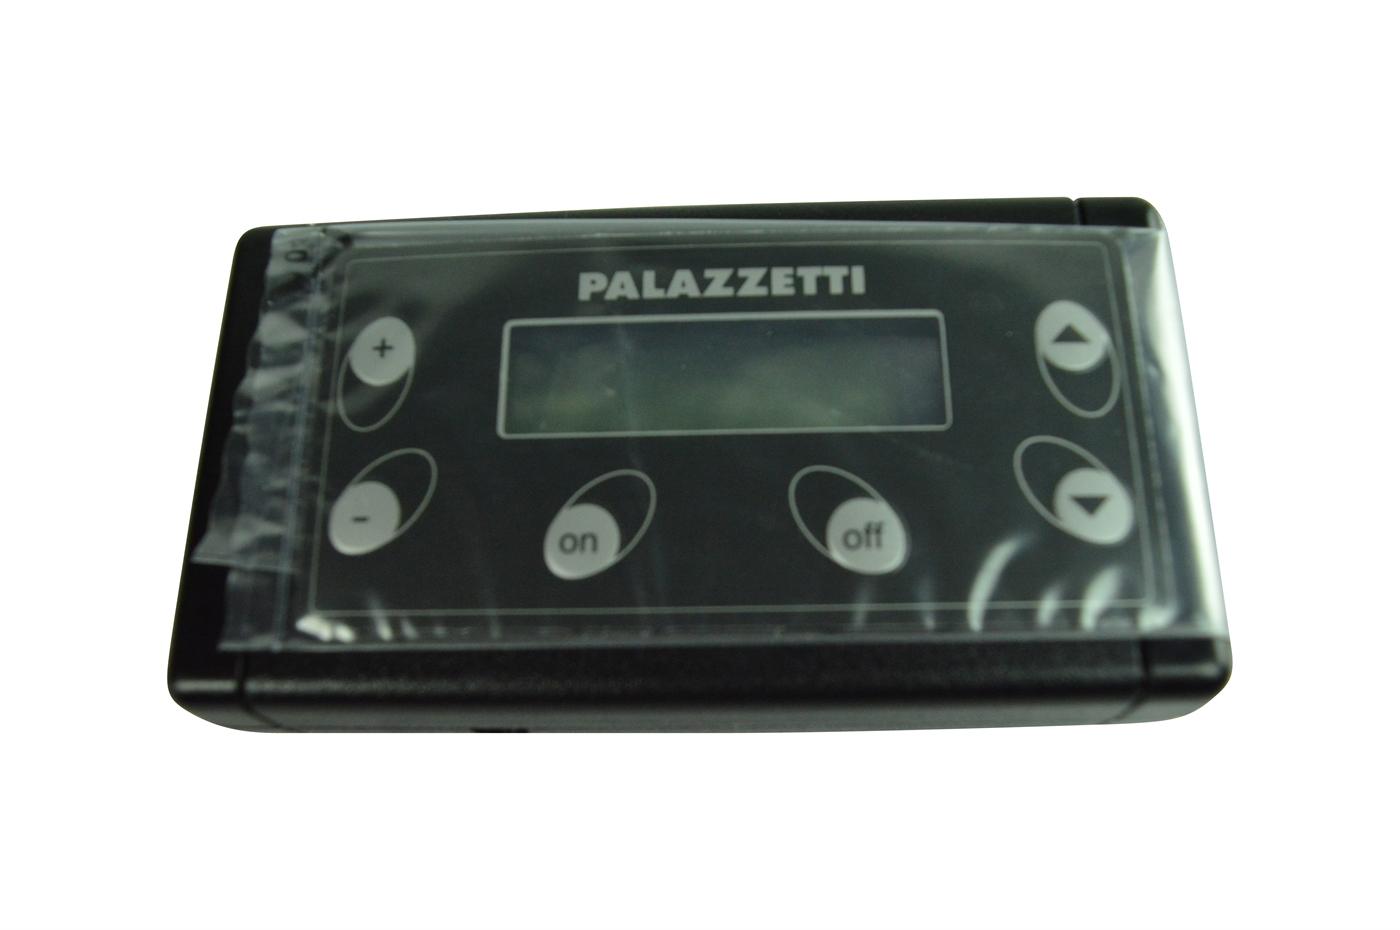 Display f/ür Pellet/öfen Multifire Palazzetti 895715120 Bedienfeld